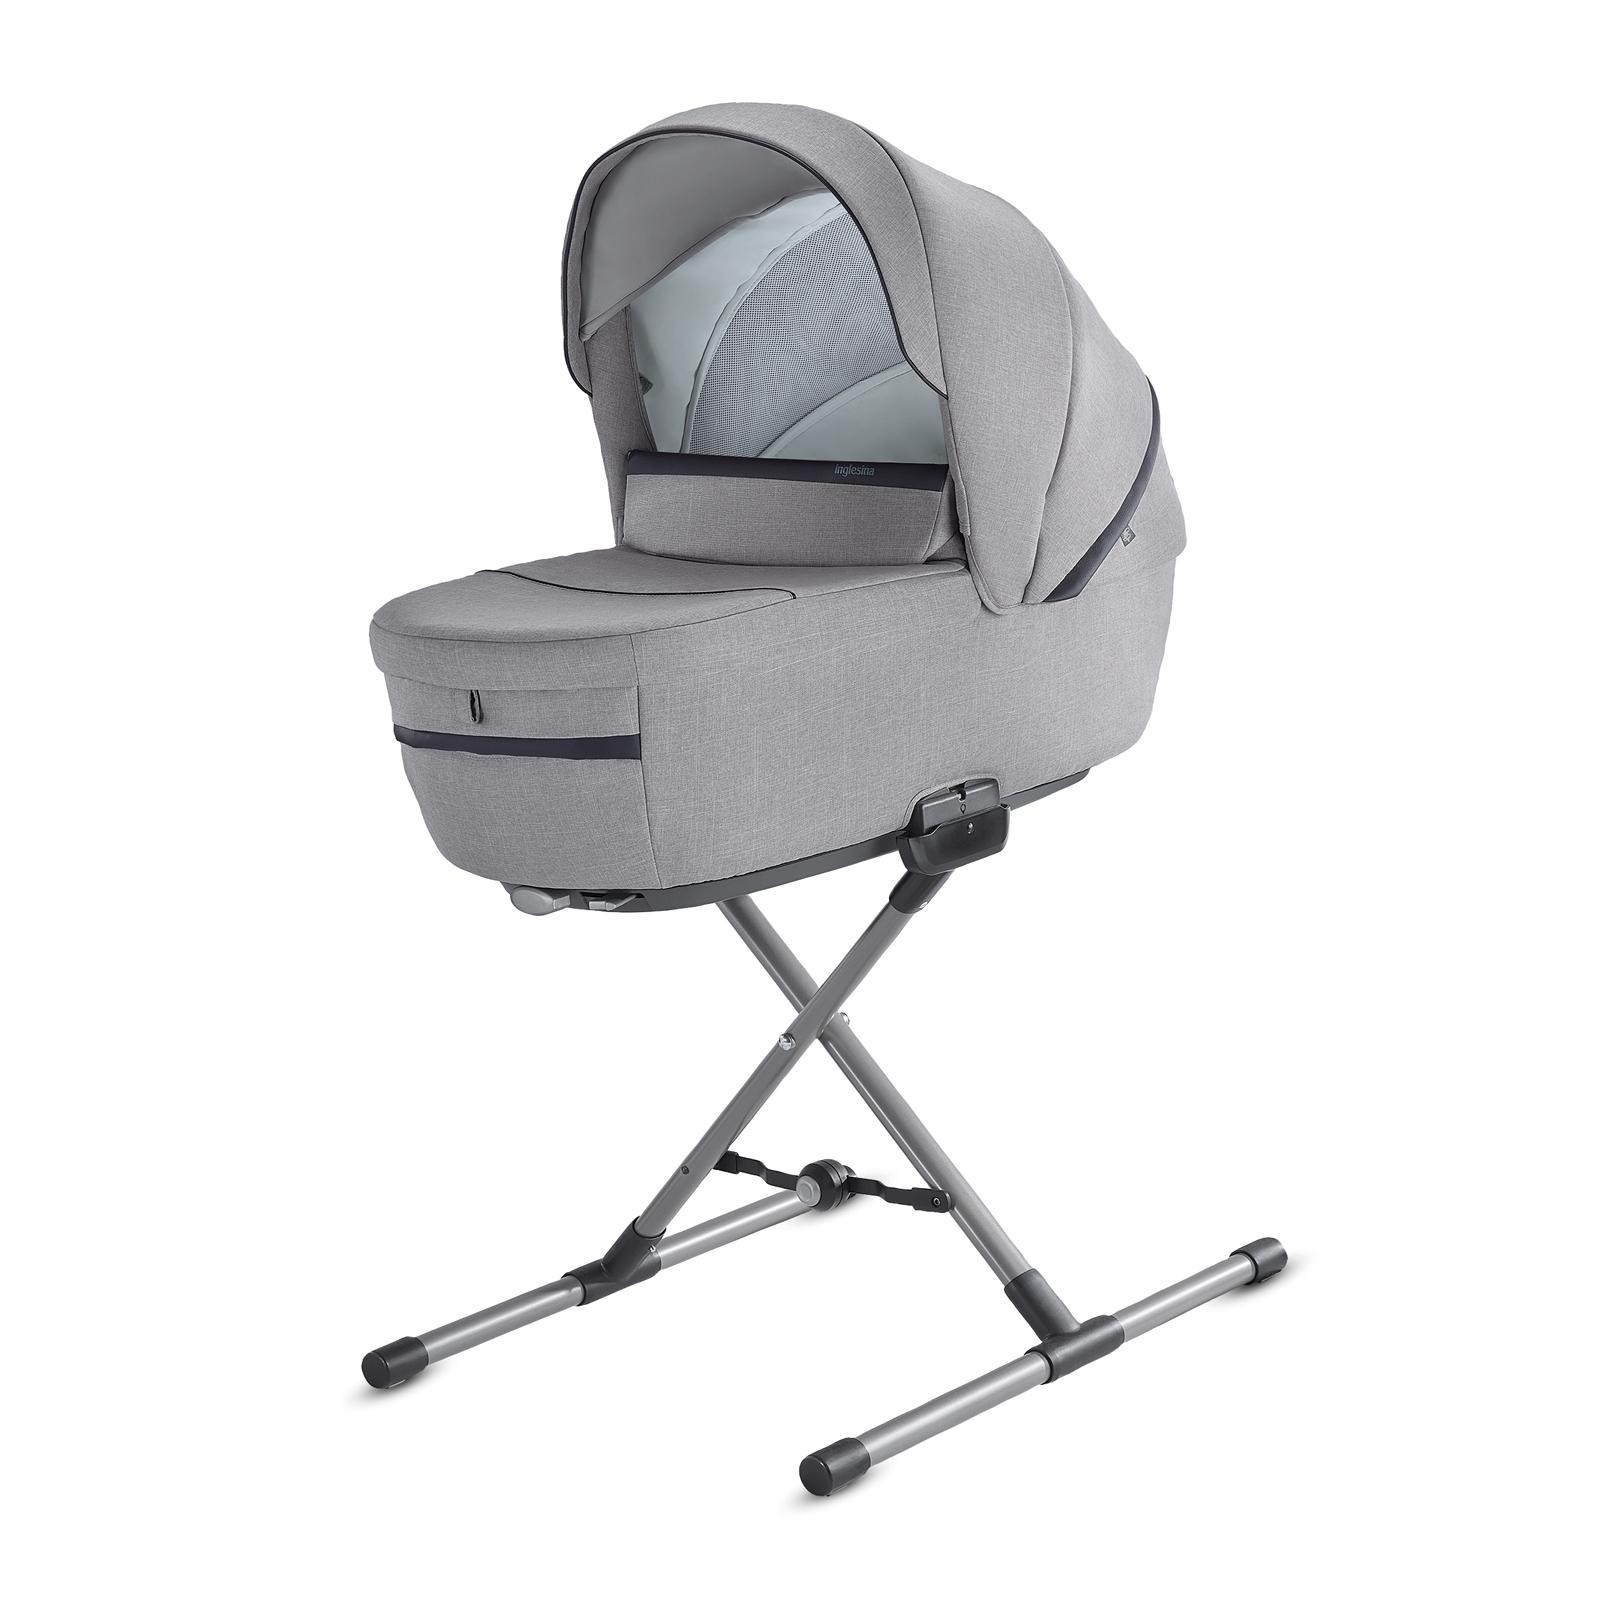 INGLESINA Aptica quattro 4v1 podvozok, hlboká vanička, športové sedadlo, autosedačka darwin silk grey